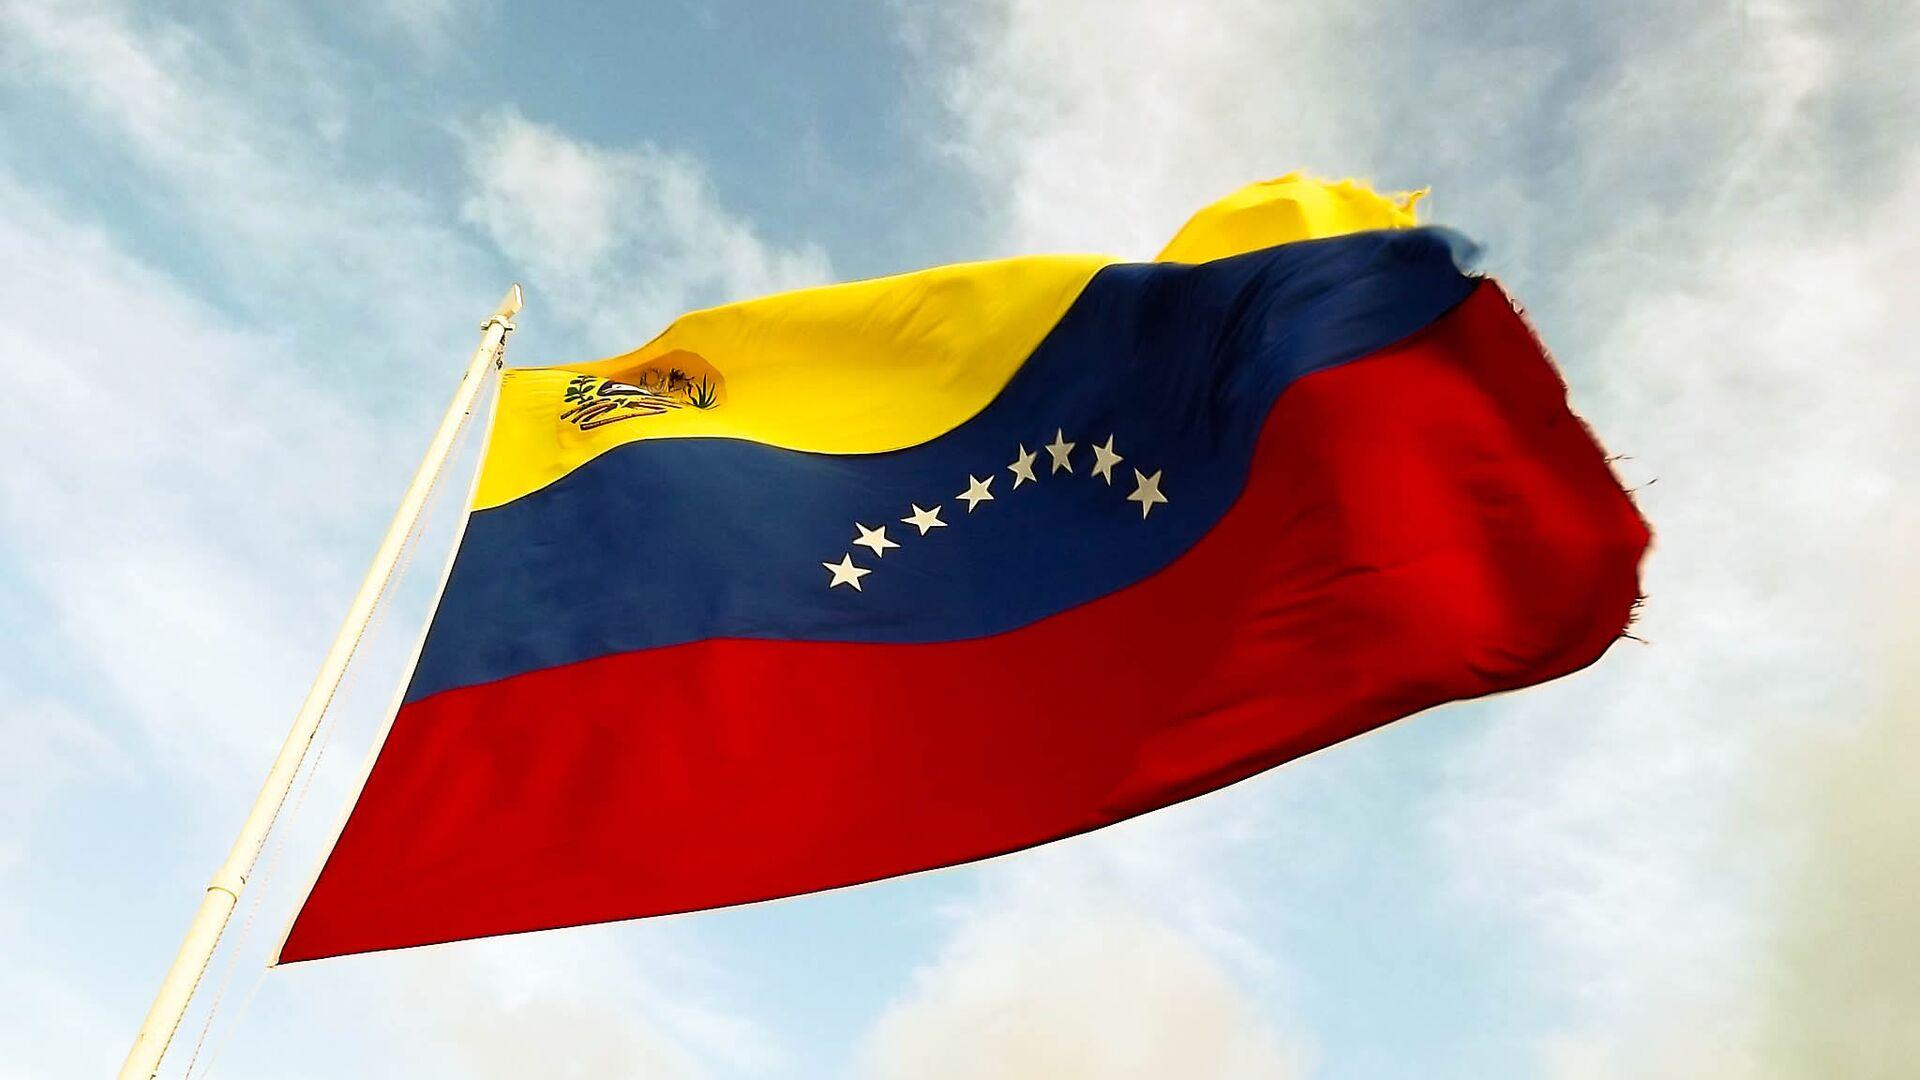 Bandera de Venezuela - Sputnik Mundo, 1920, 21.01.2021